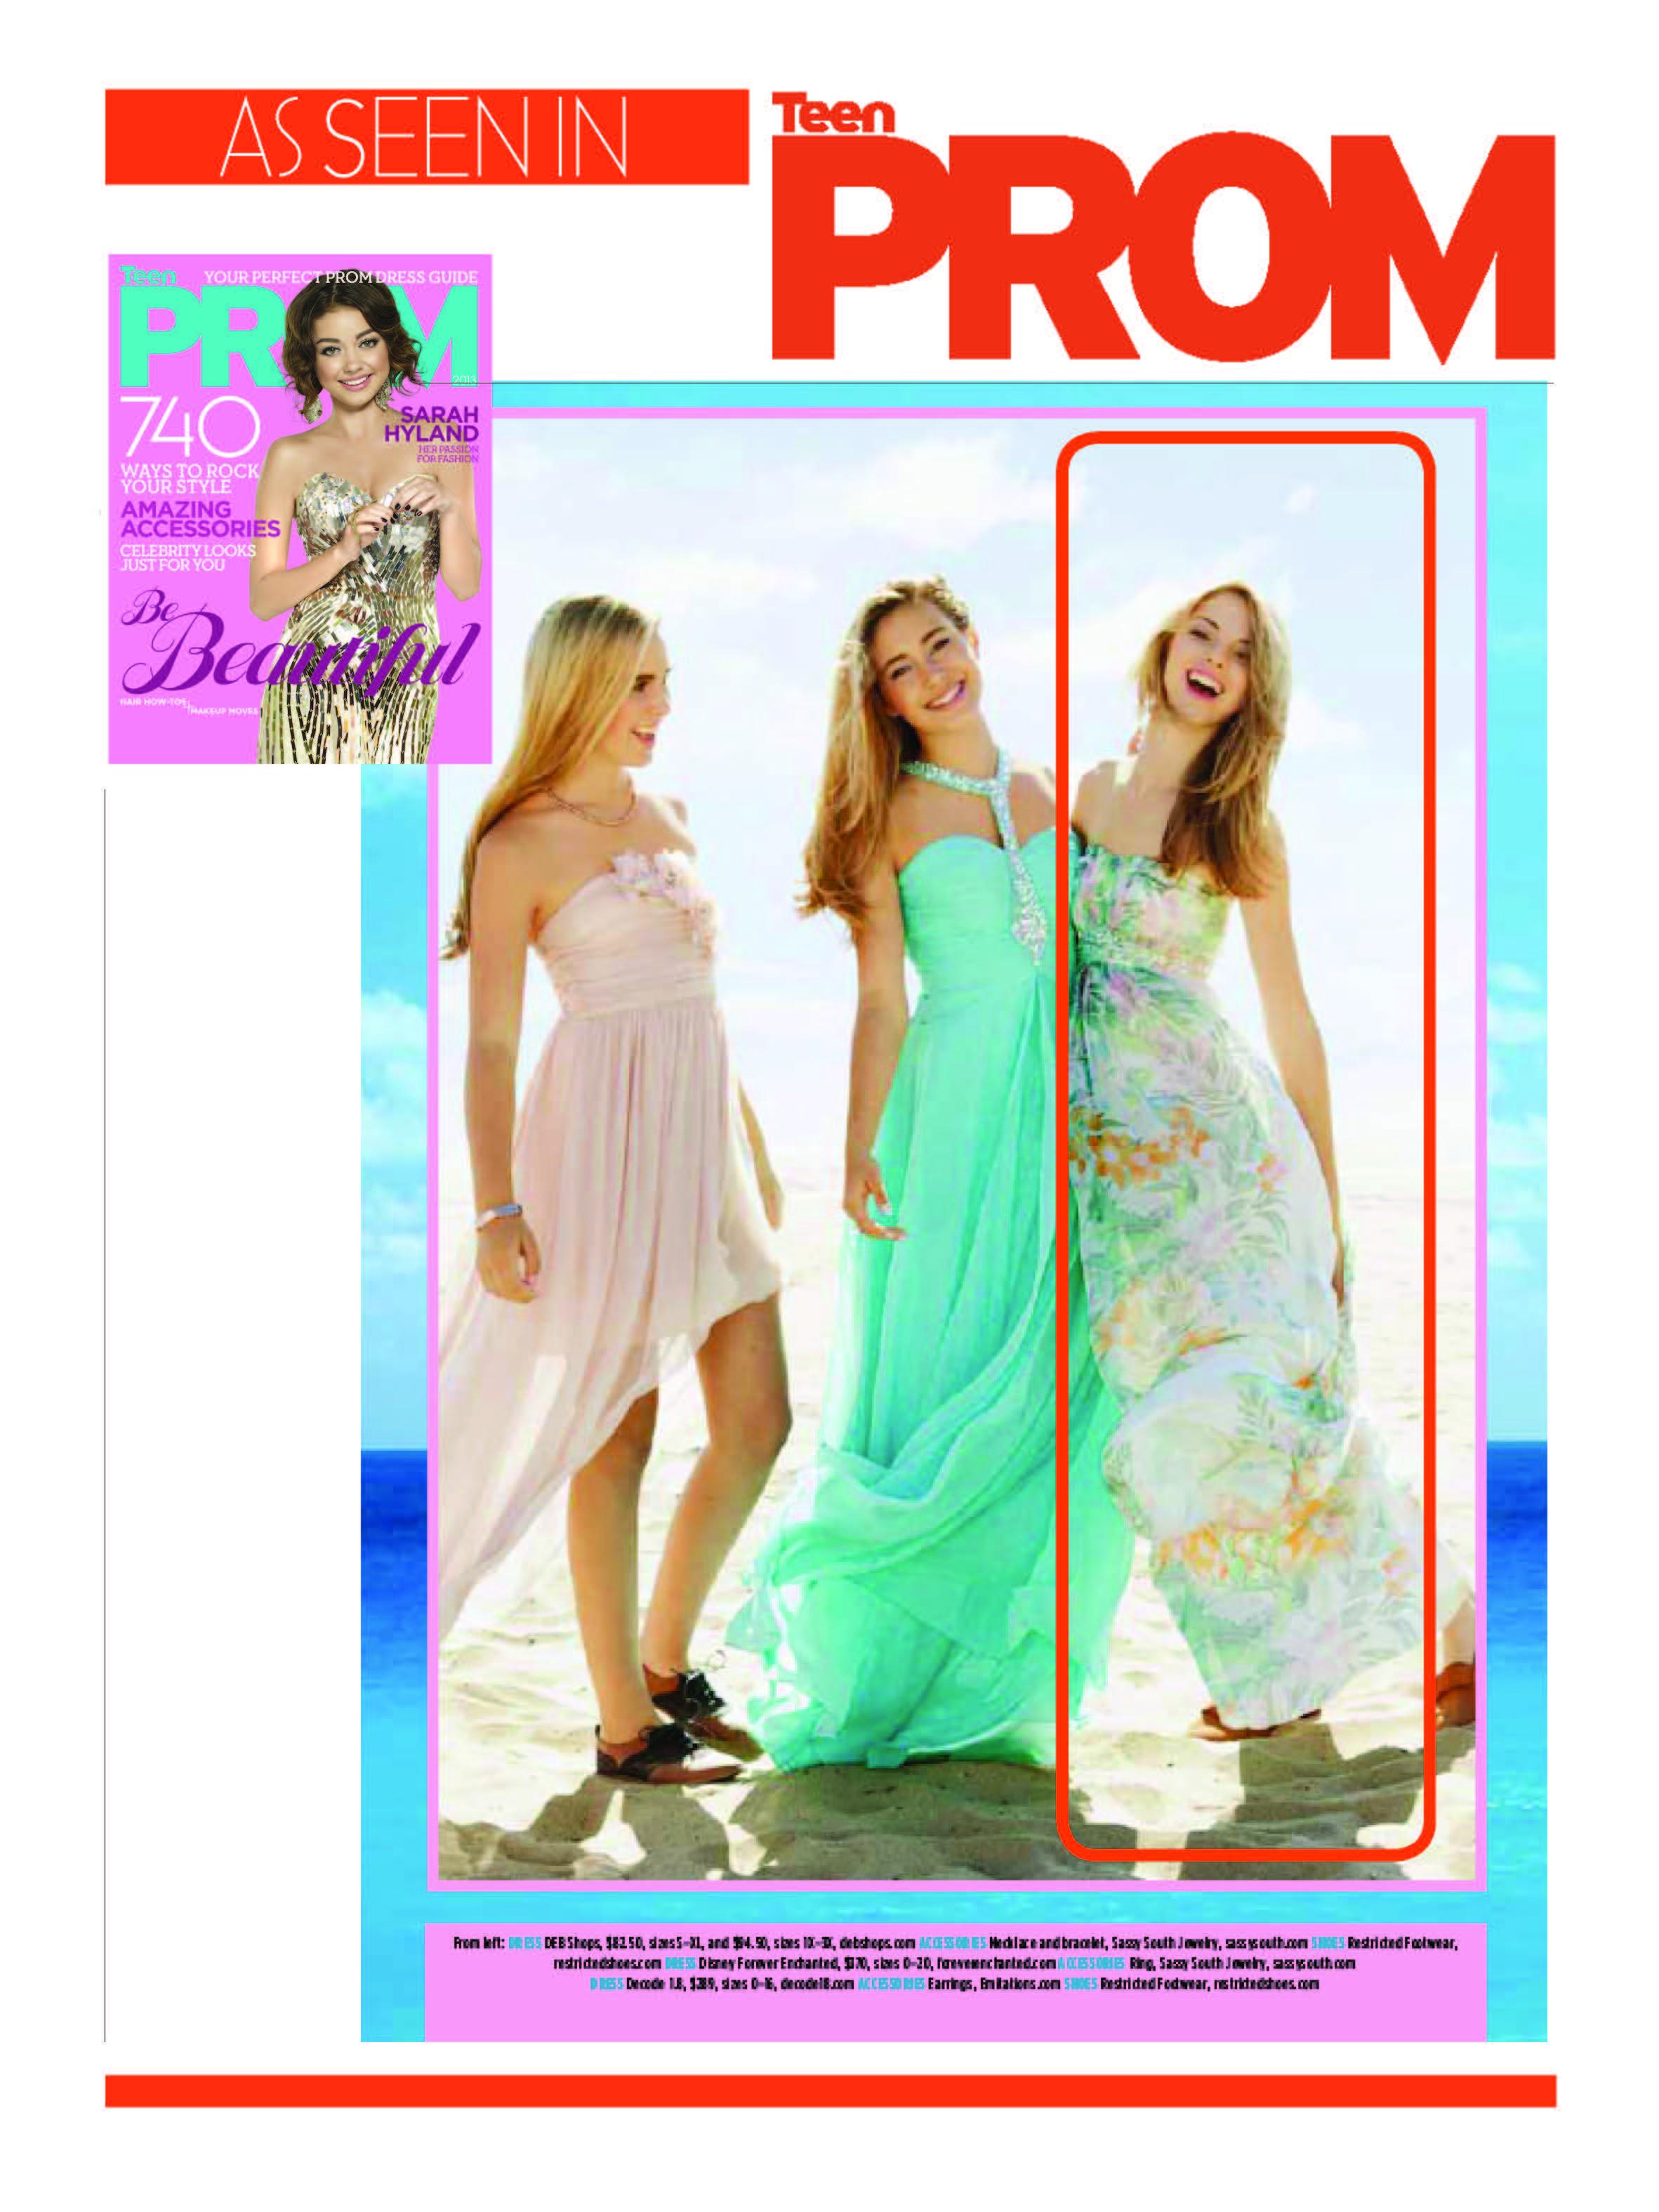 Teen prom 1 - Decode 1.8